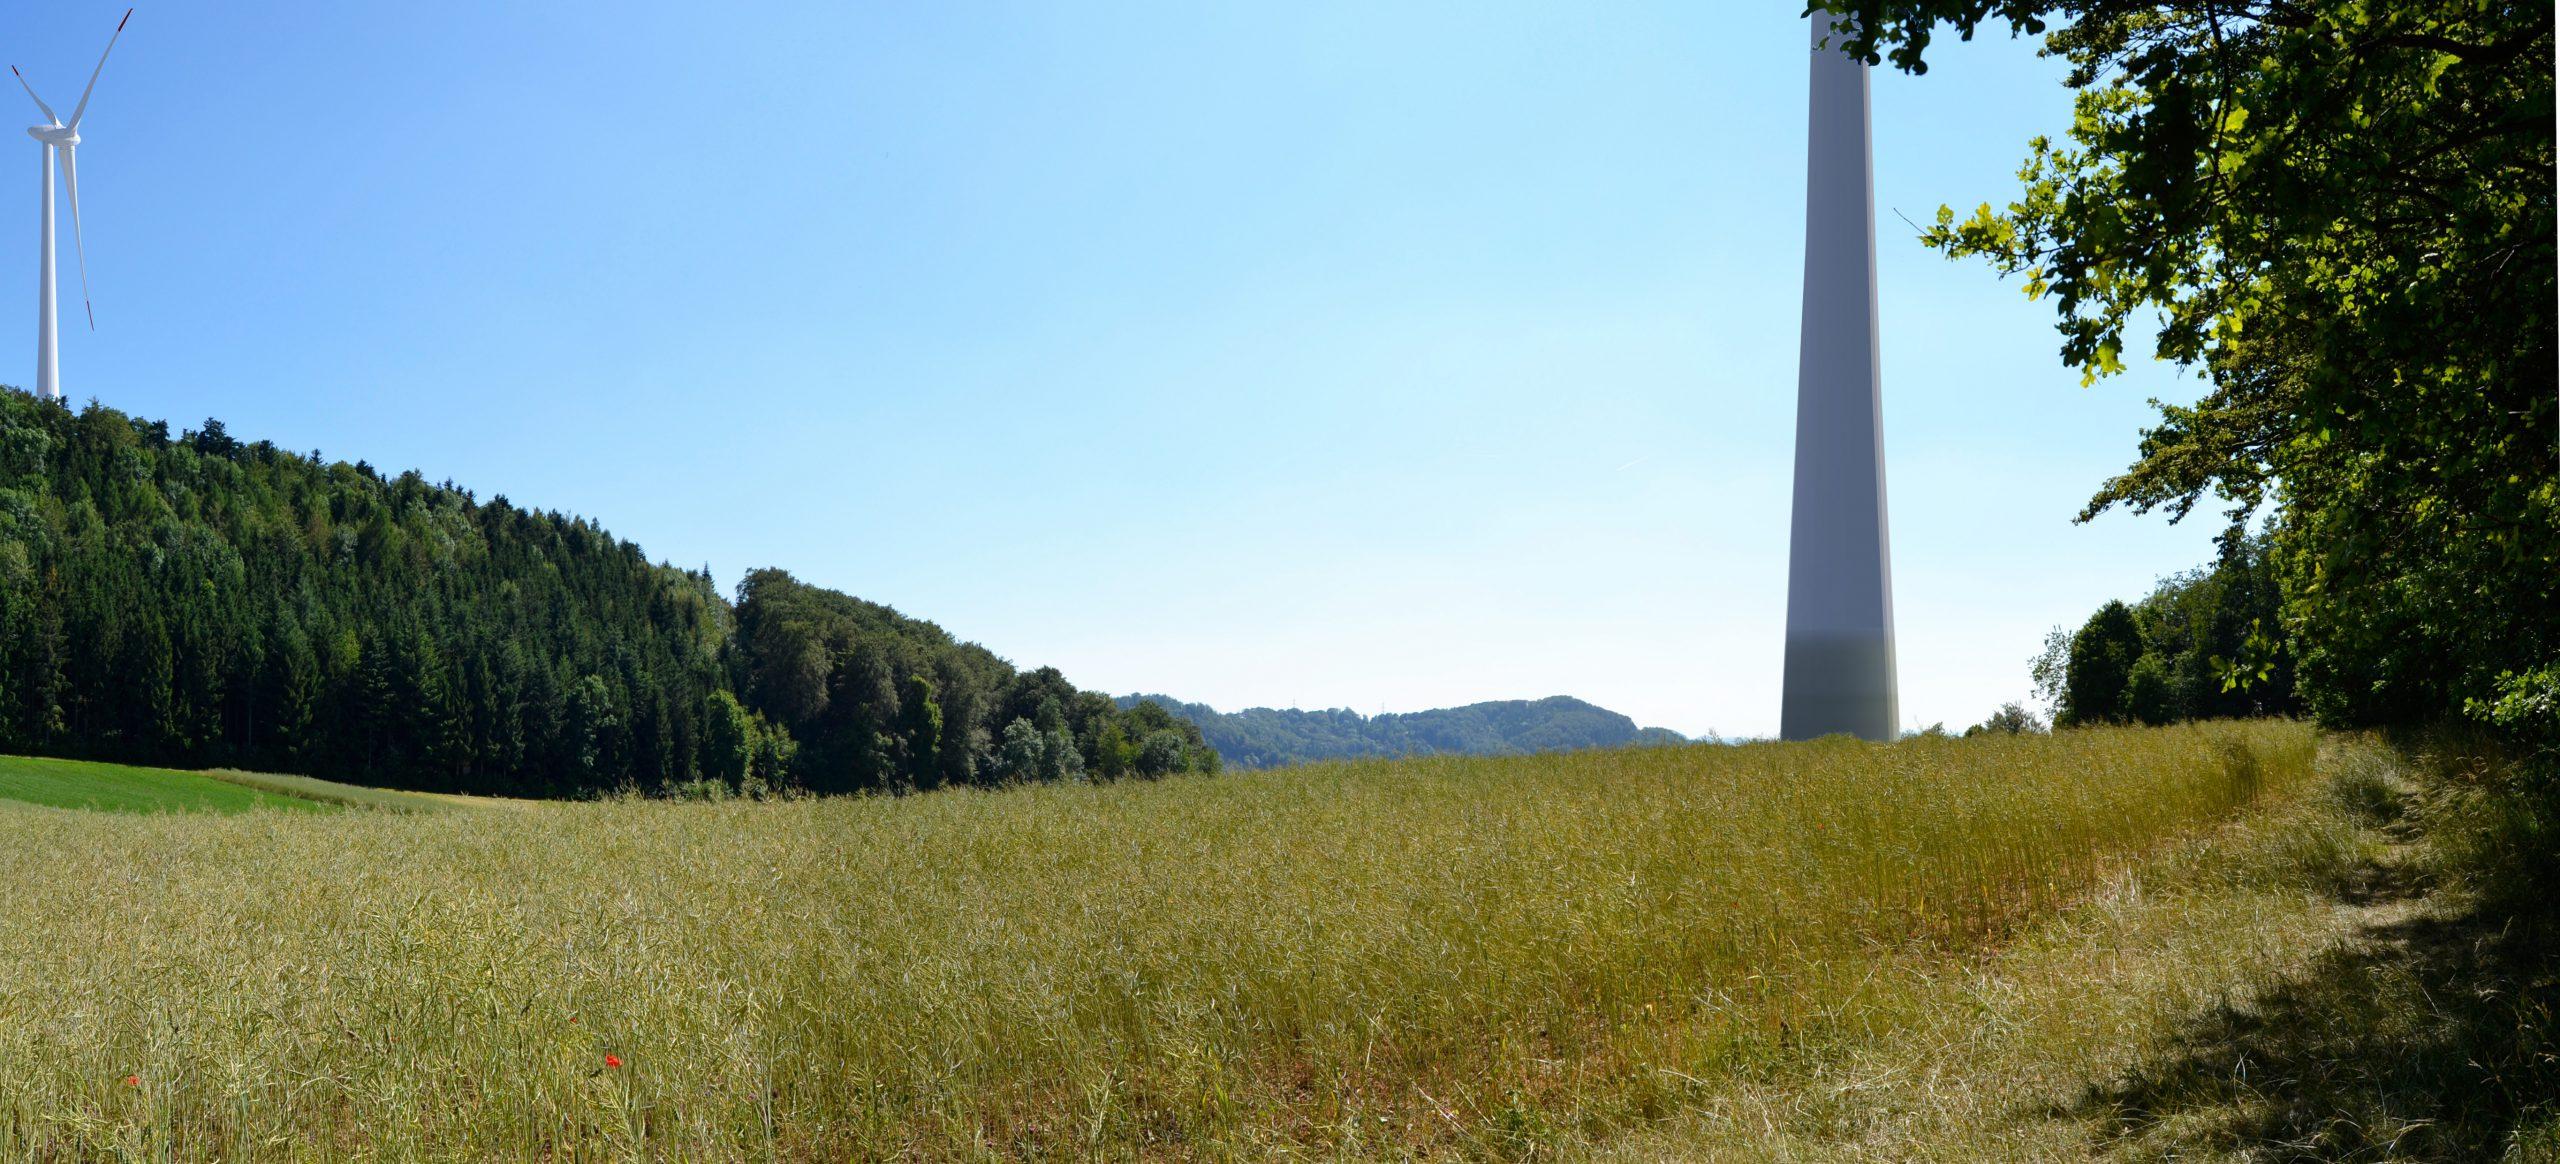 Neues Konzept Windenergie